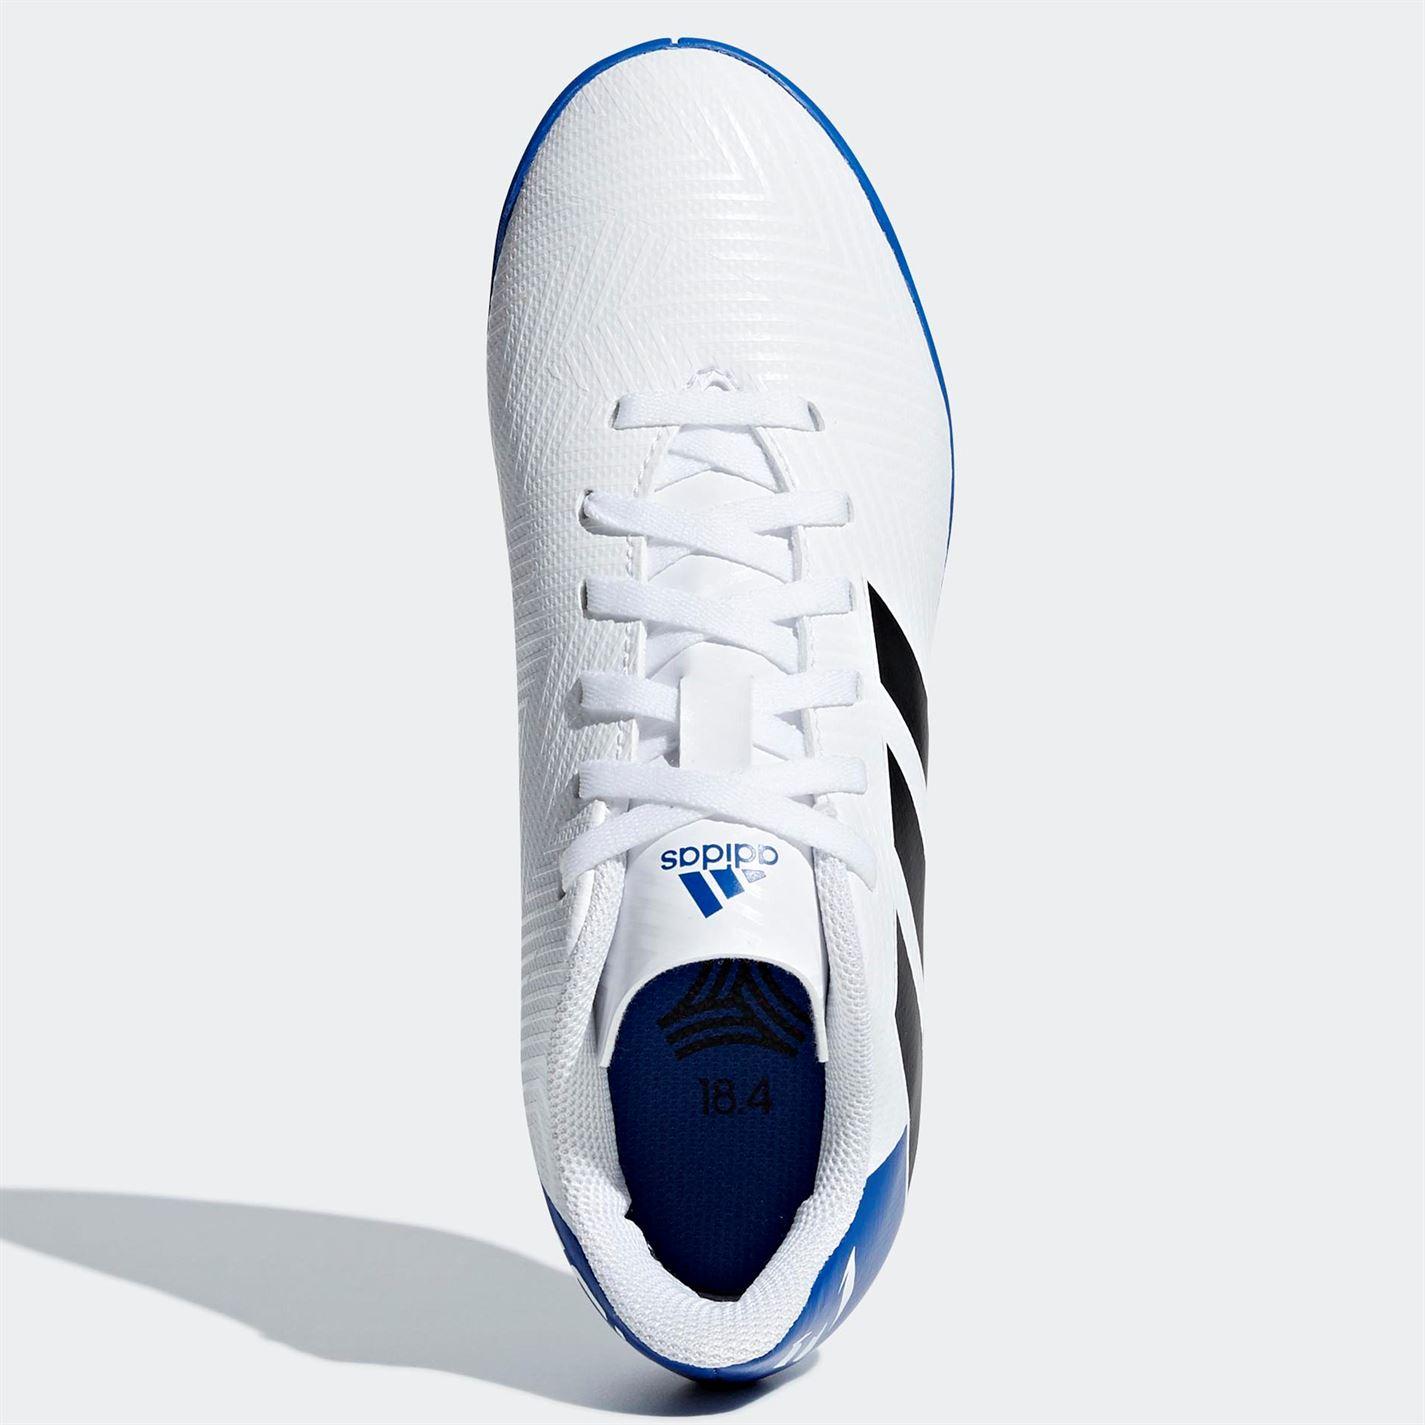 757634ef257 adidas Kids Nemeziz Messi Tango 18.4 Junior Indoor Football Trainers ...